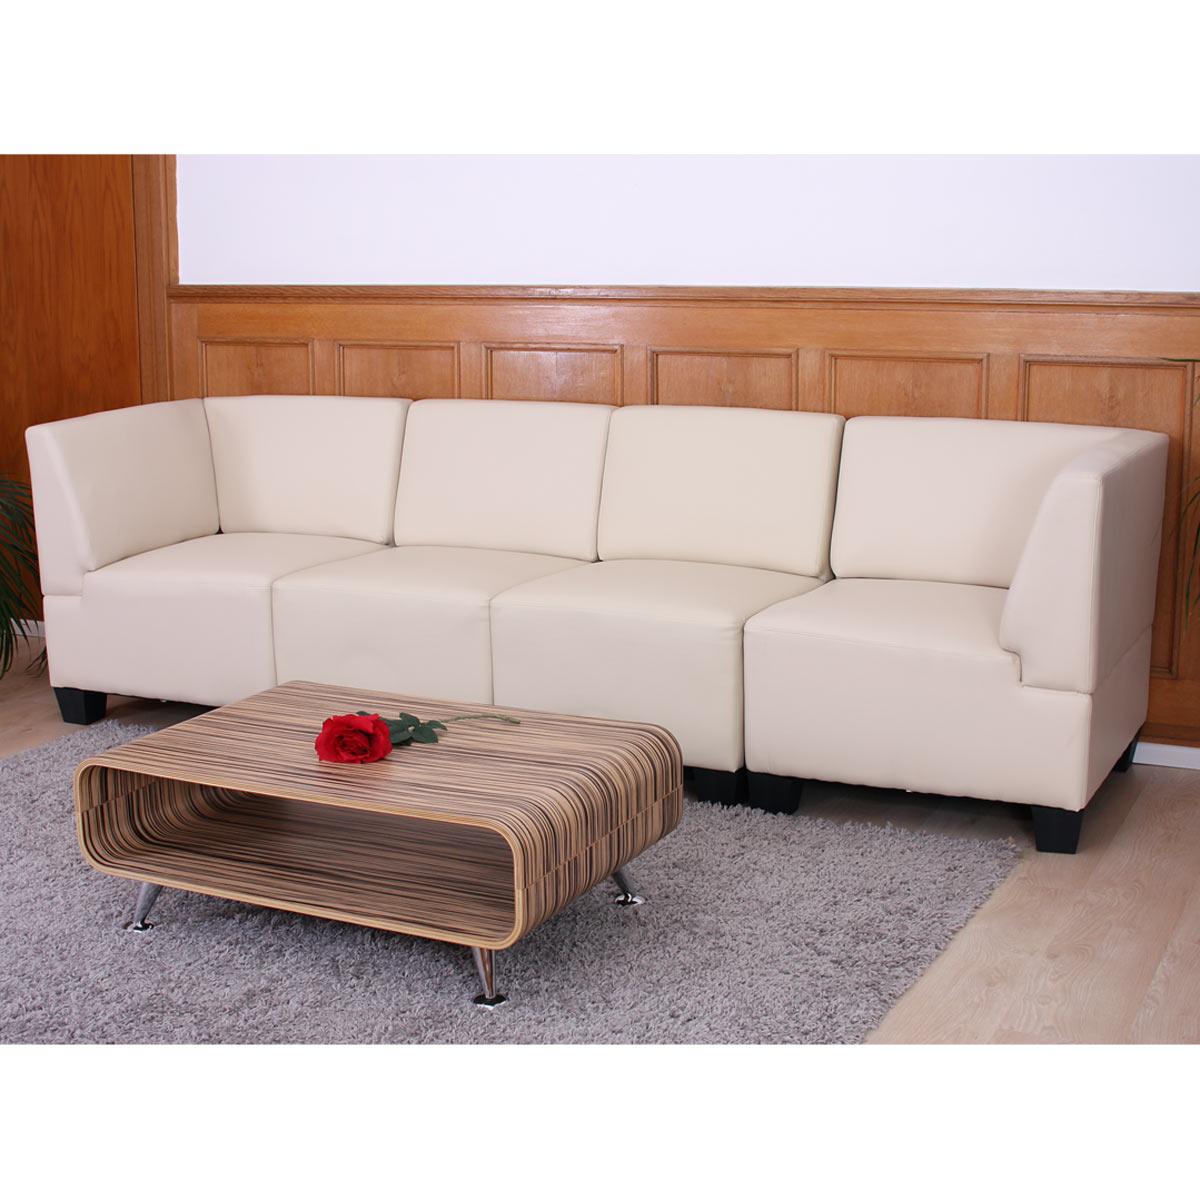 modular viersitzer sofa couch lyon kunstleder schwarz. Black Bedroom Furniture Sets. Home Design Ideas